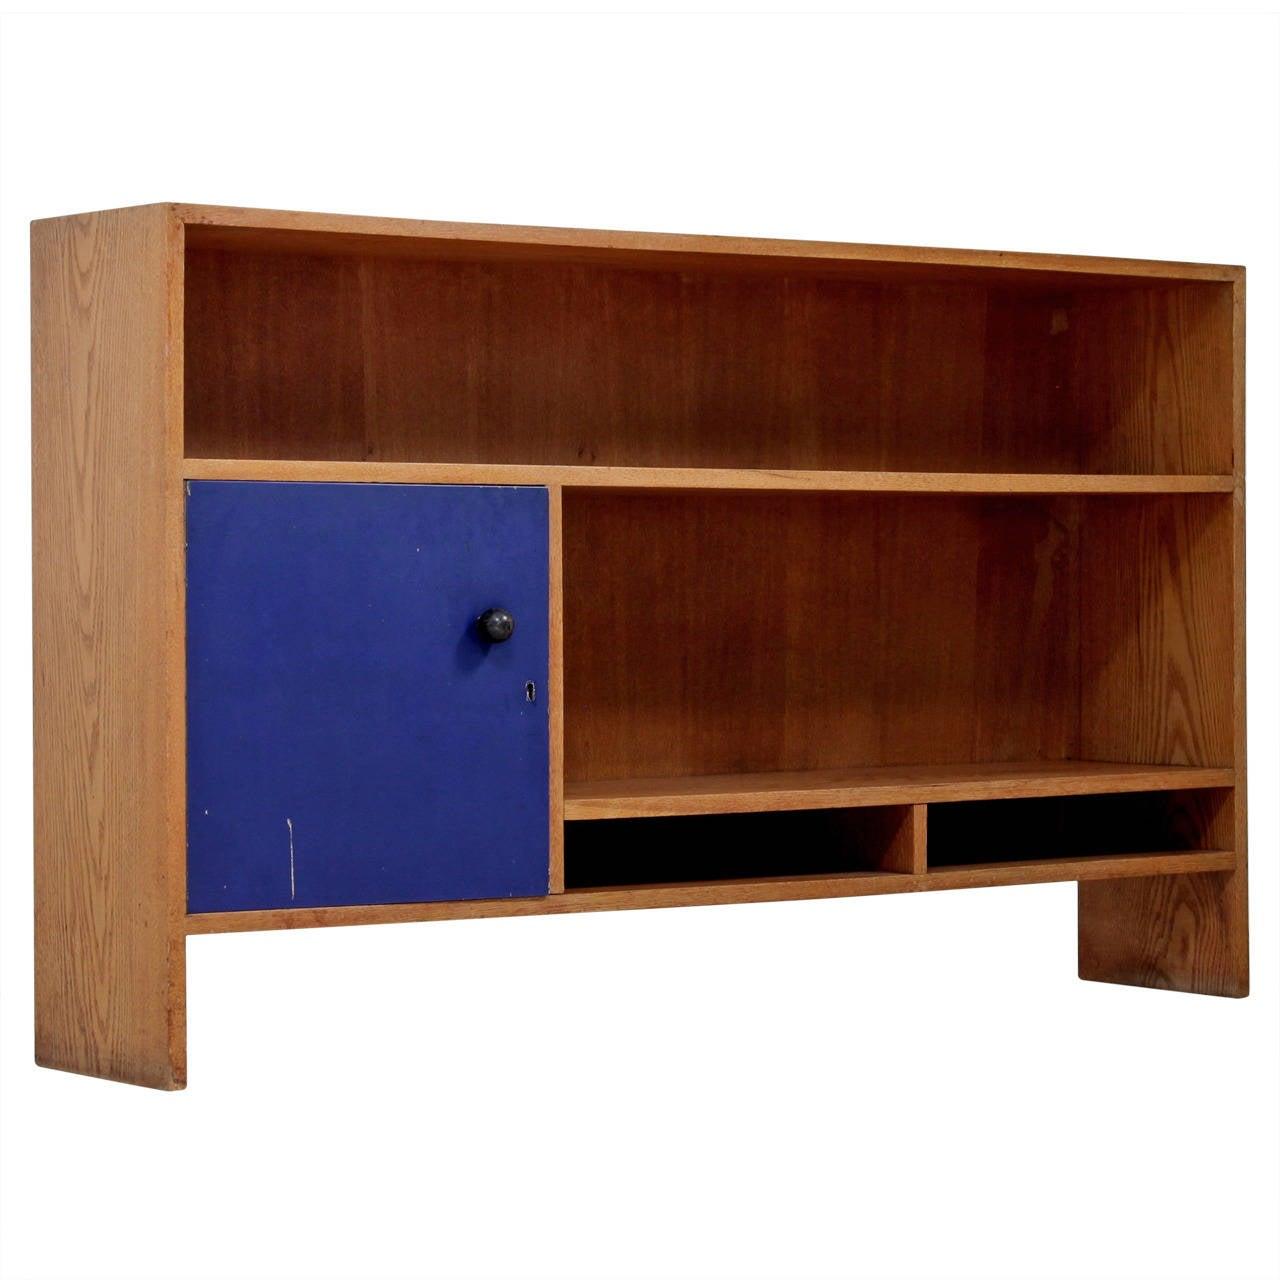 canlisohbethattinizcom in bookshelves usa bookcases made bookcase custom